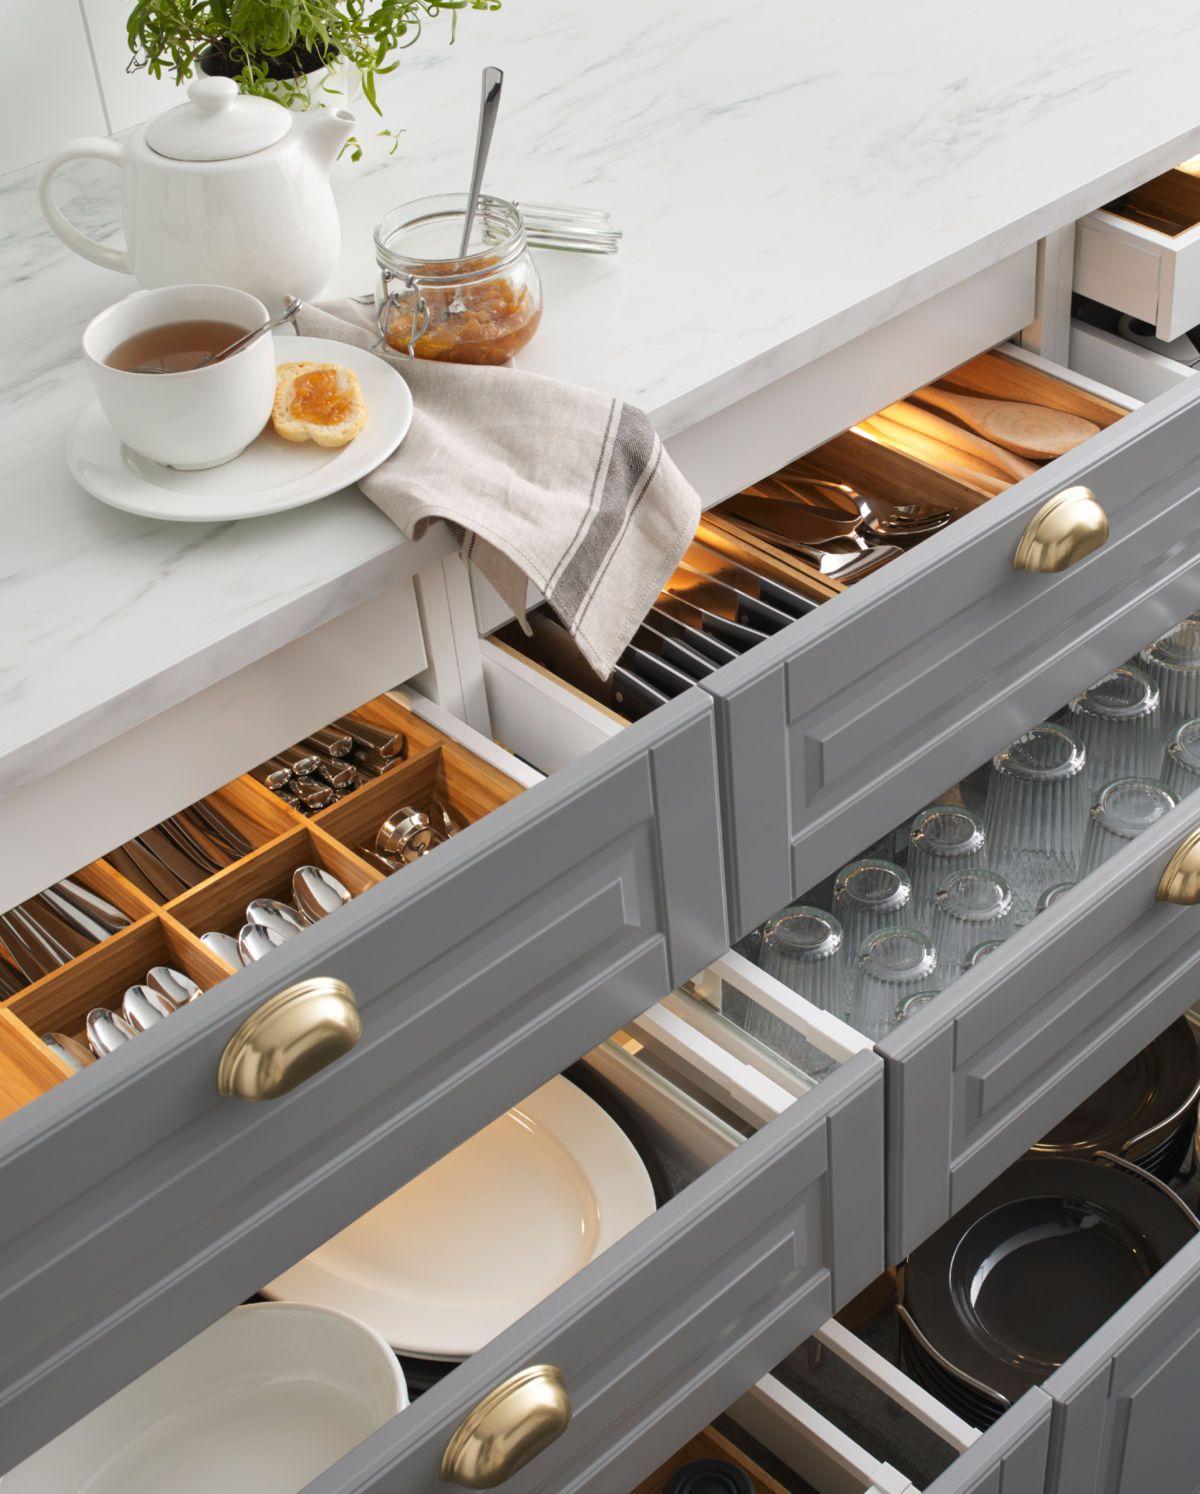 brochure cuisines ikea 2017 idee1 pinterest cuisine. Black Bedroom Furniture Sets. Home Design Ideas